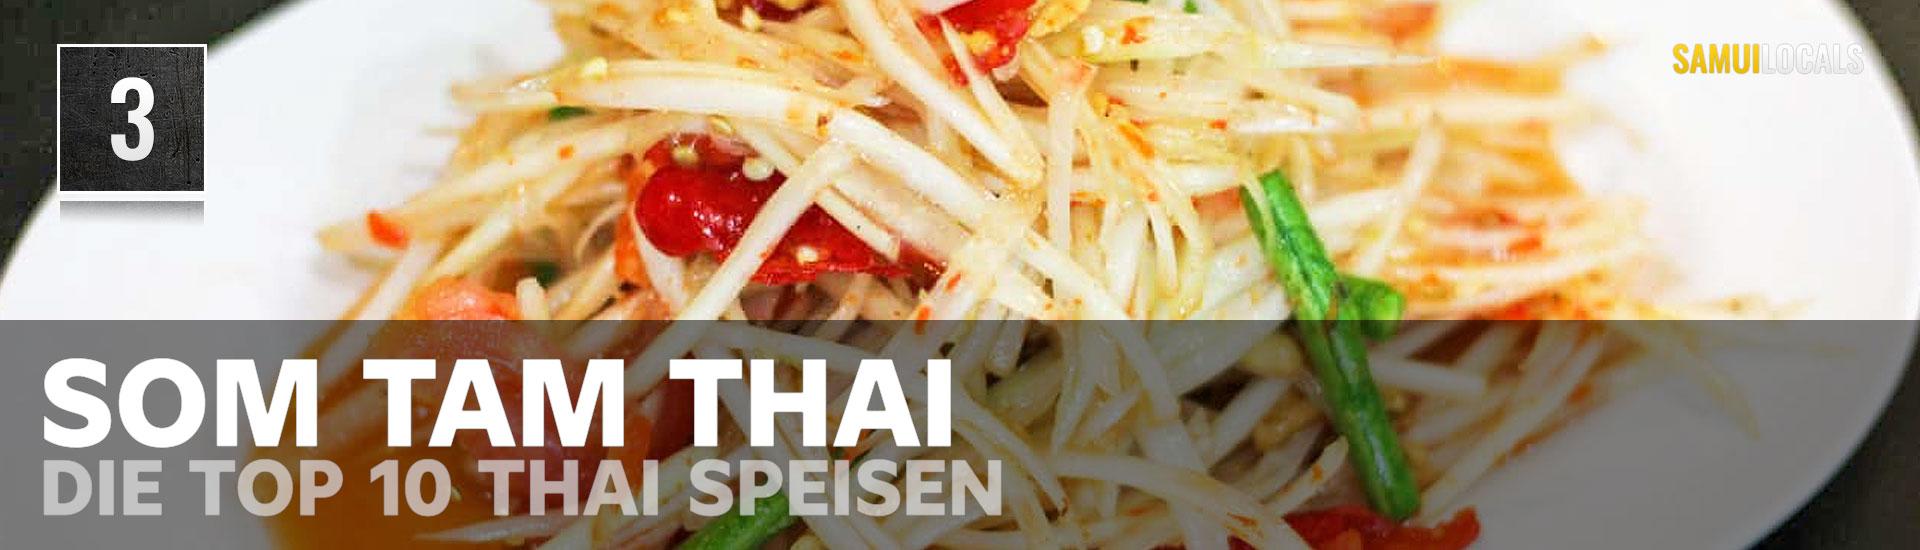 top_10_thai_gerichte_som_tam_thai